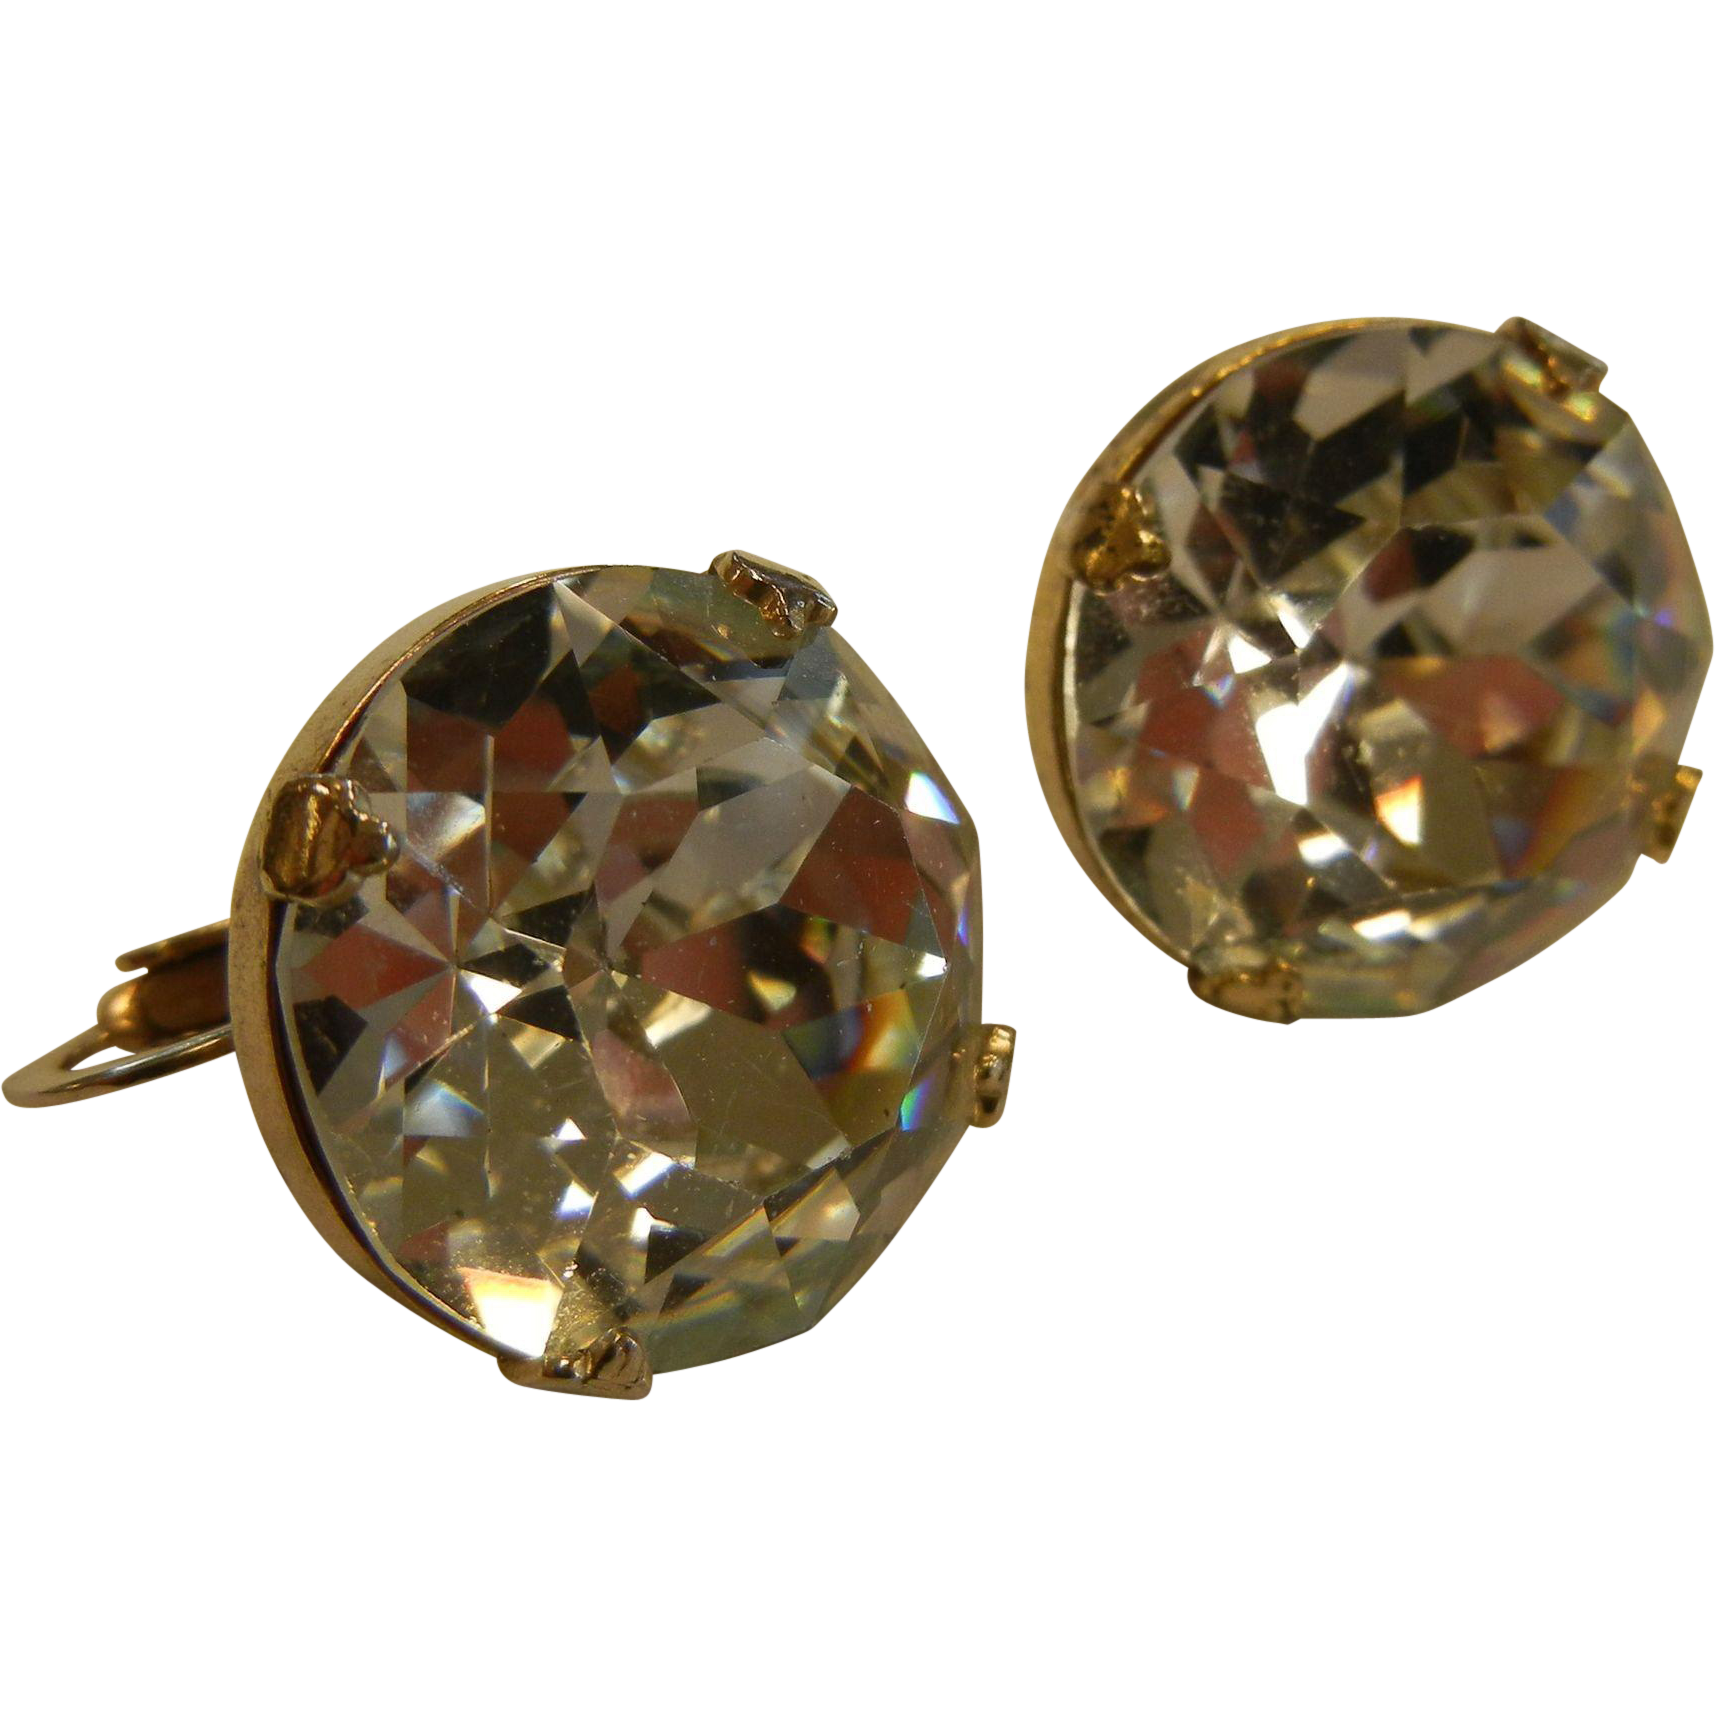 Giant Vintage Brilliant Rhinestone Clip-On Earrings